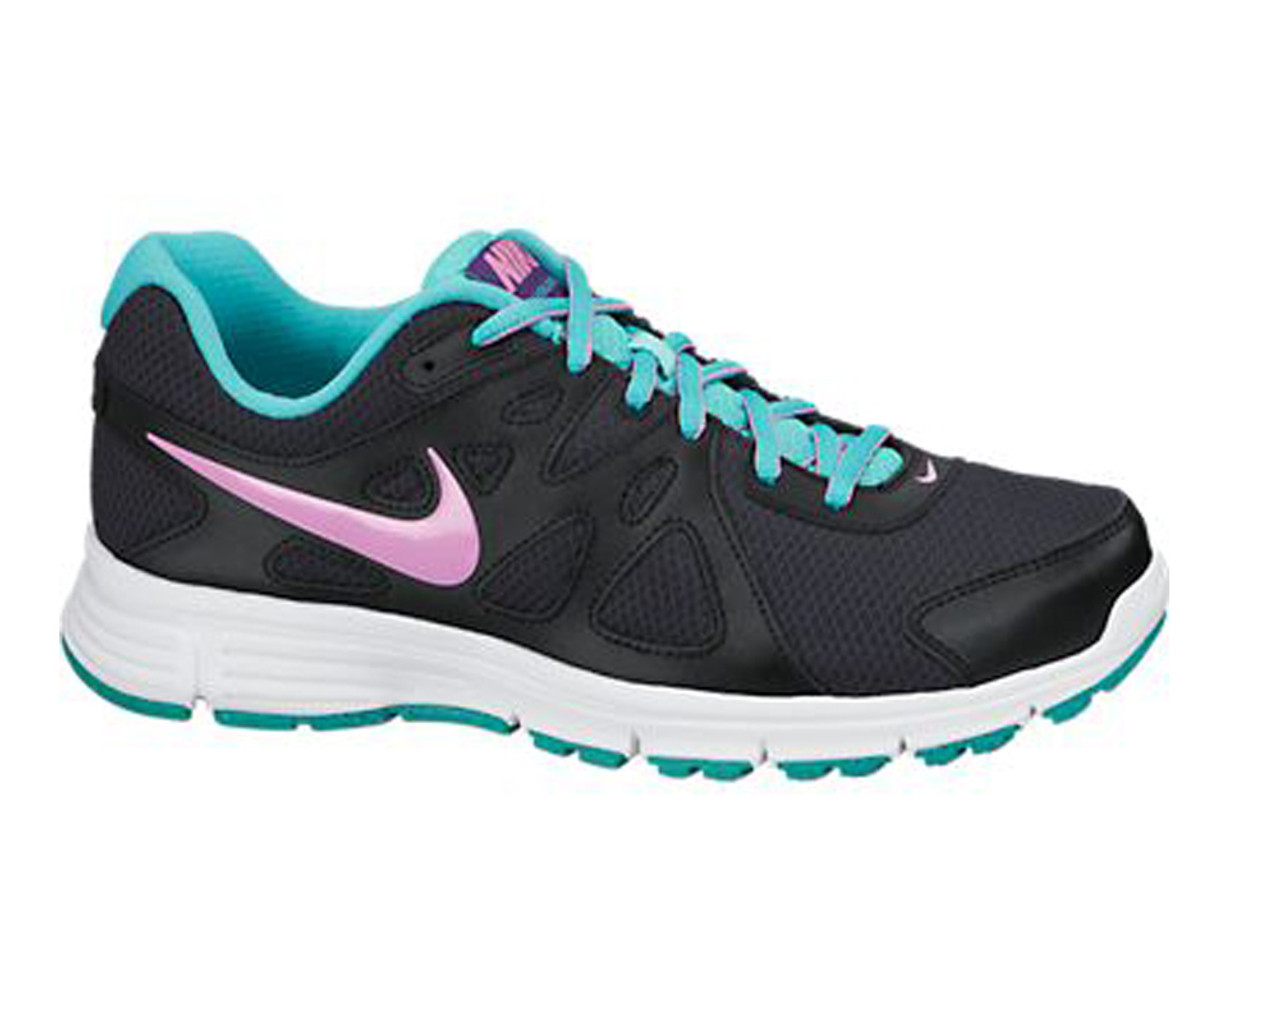 Nike Women s Revolution 2 Running Shoes Black Hyper Jade - Shop now    Shoolu. c4f308249